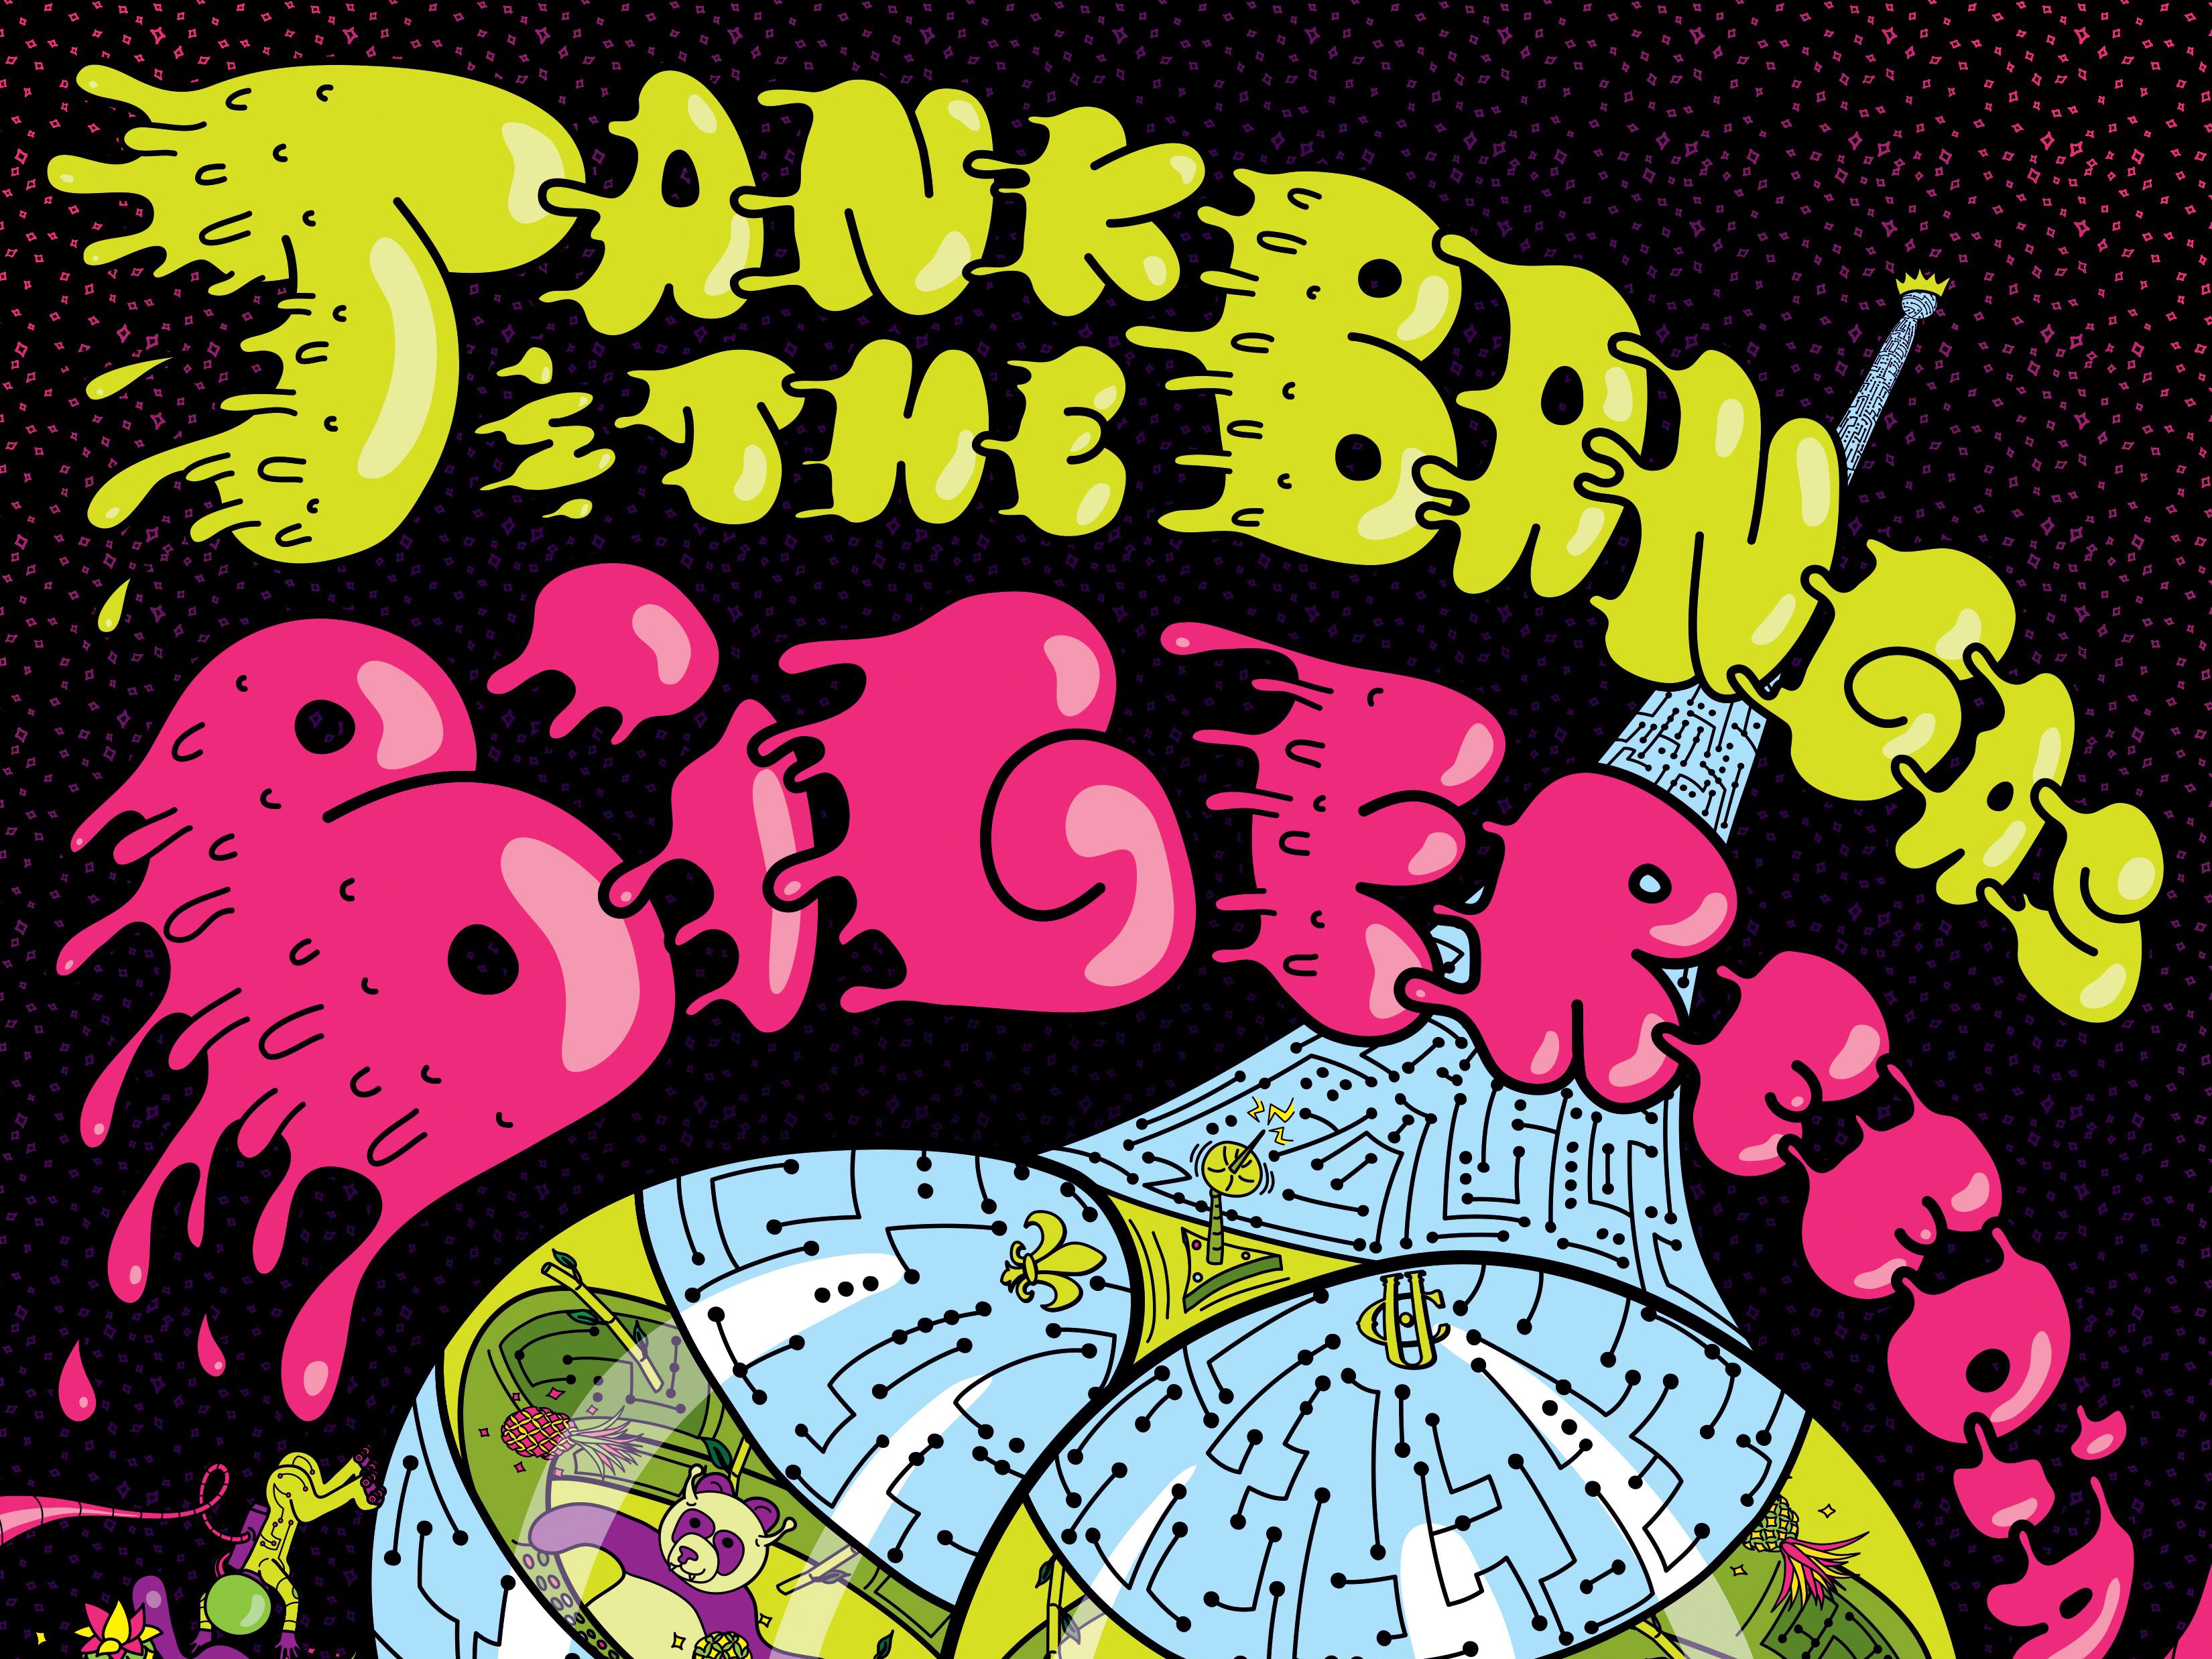 Tank and the bangas   big freedia   uct110918   commemorative poster   11x17   cs6 v19 print rgb red